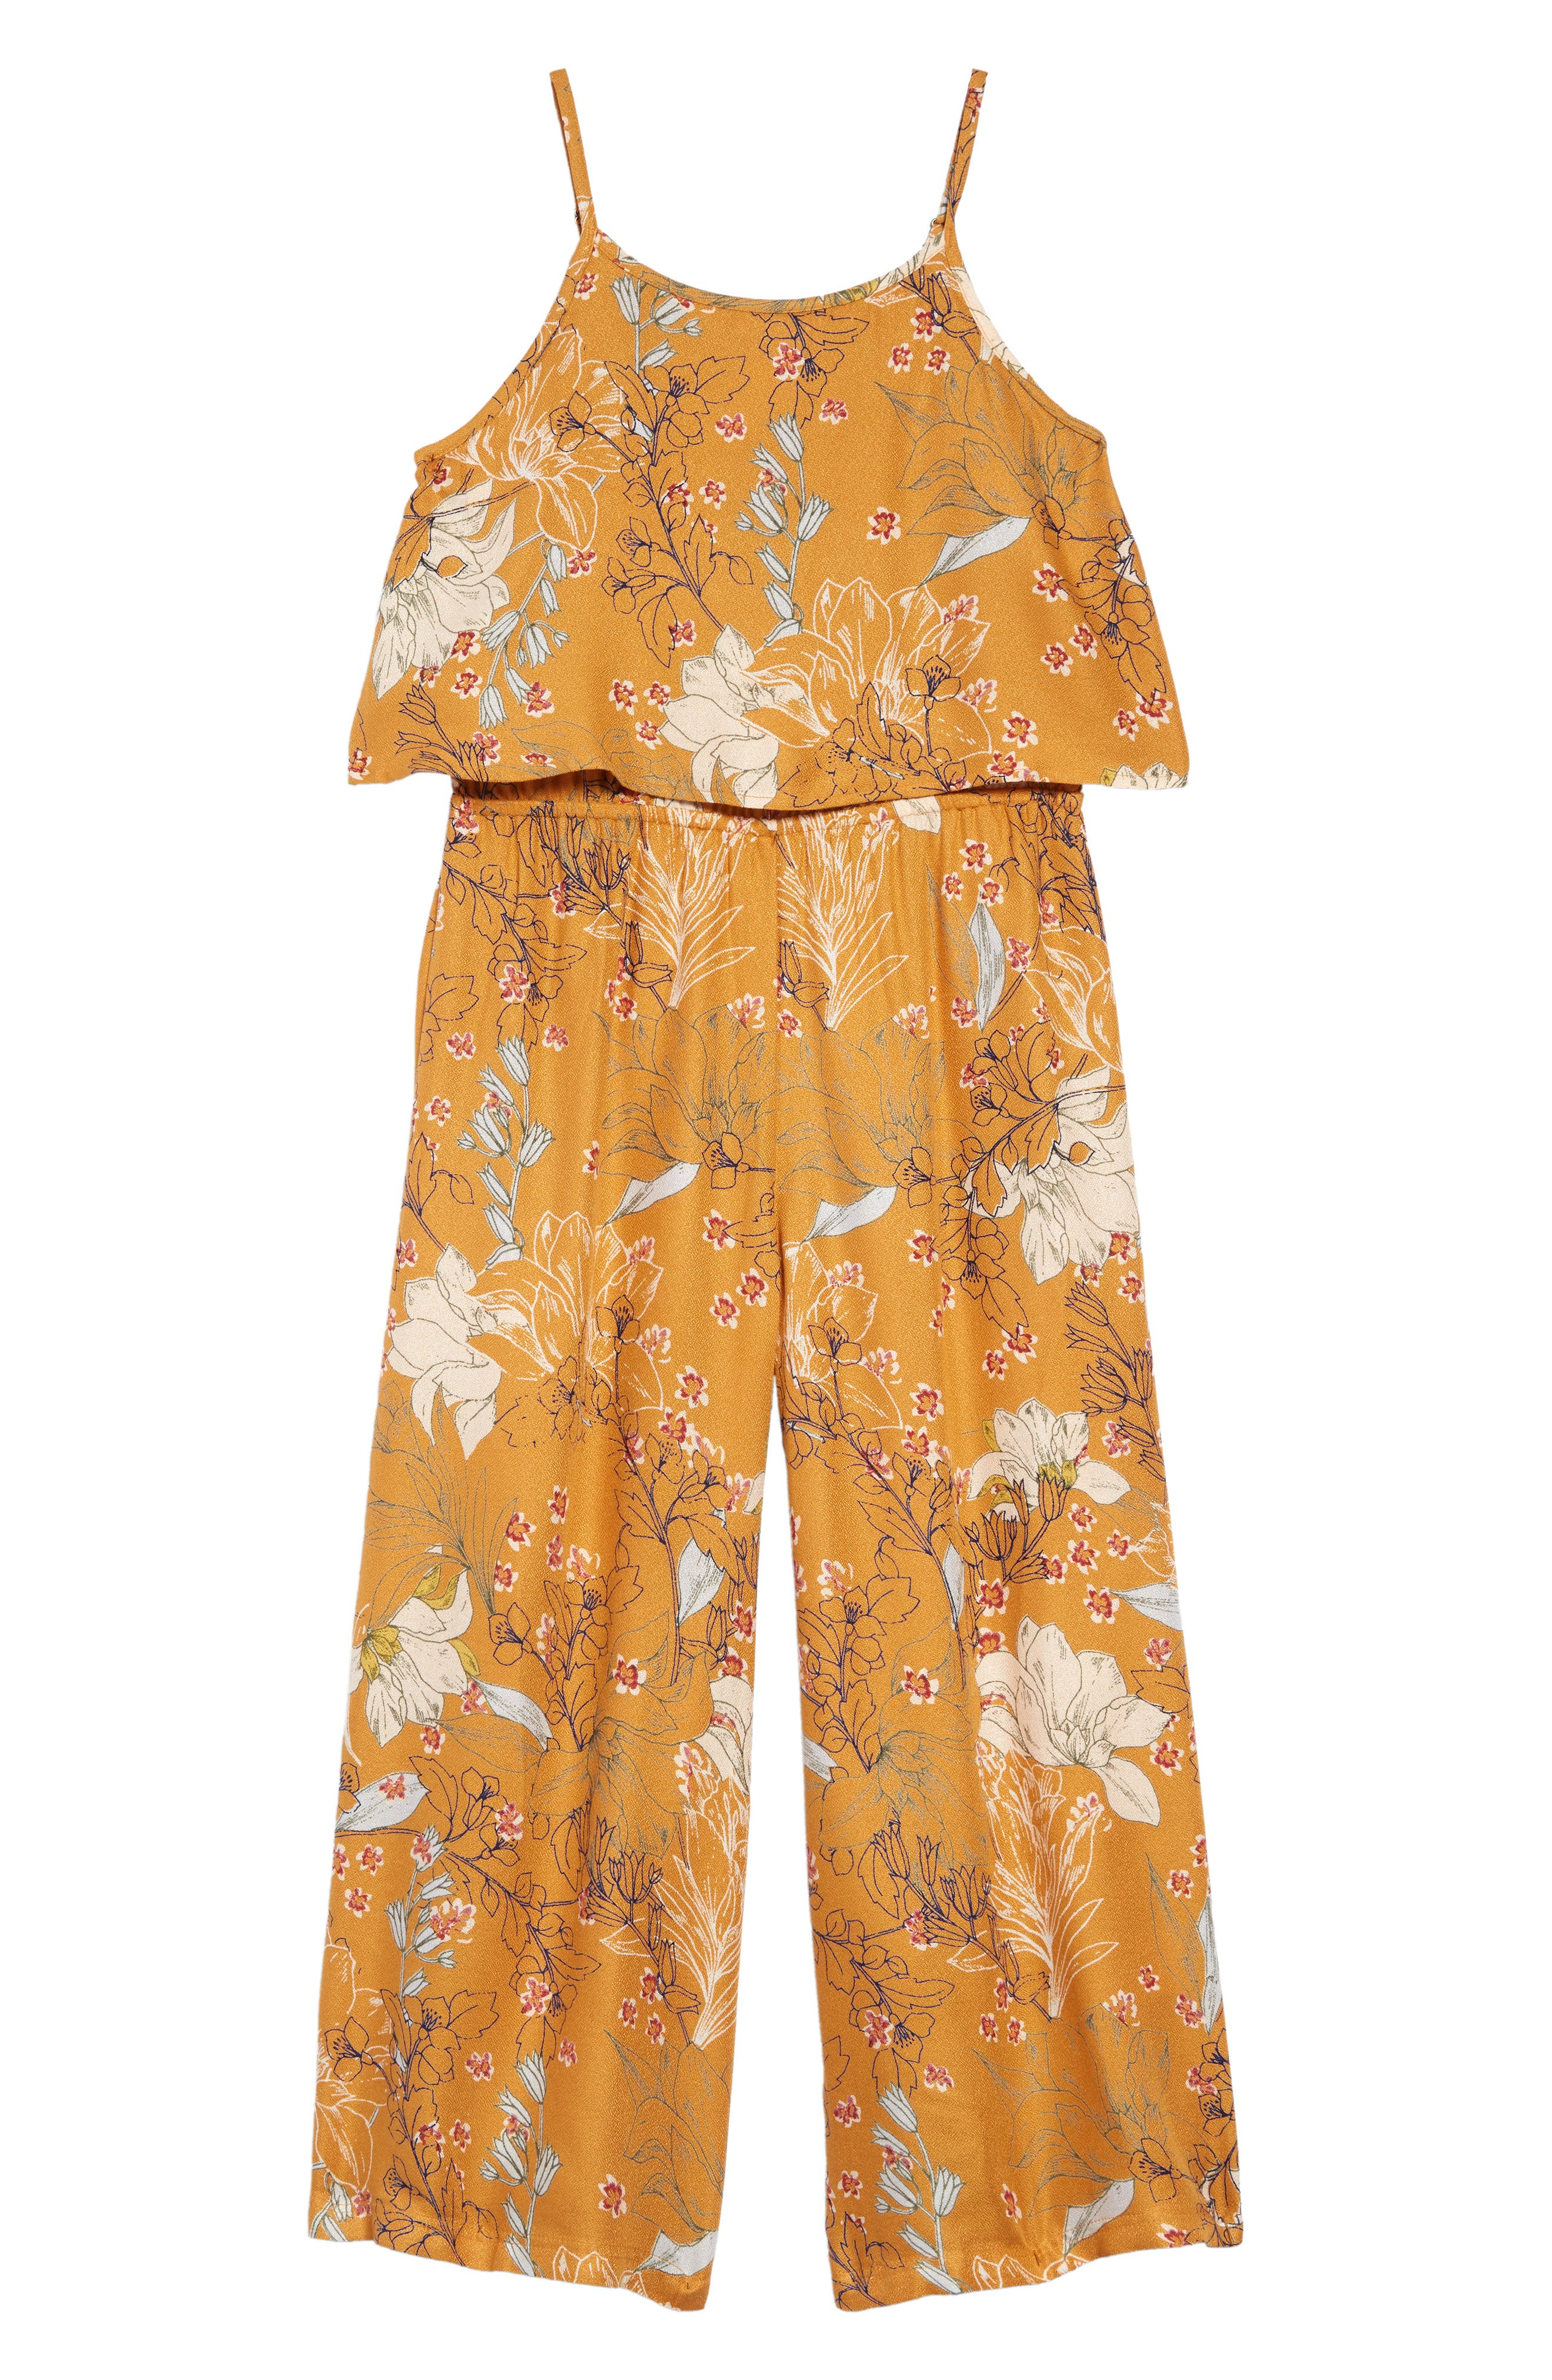 Girls ONeill Peony Sleeveless Jumpsuit Size S (78)  Yellow